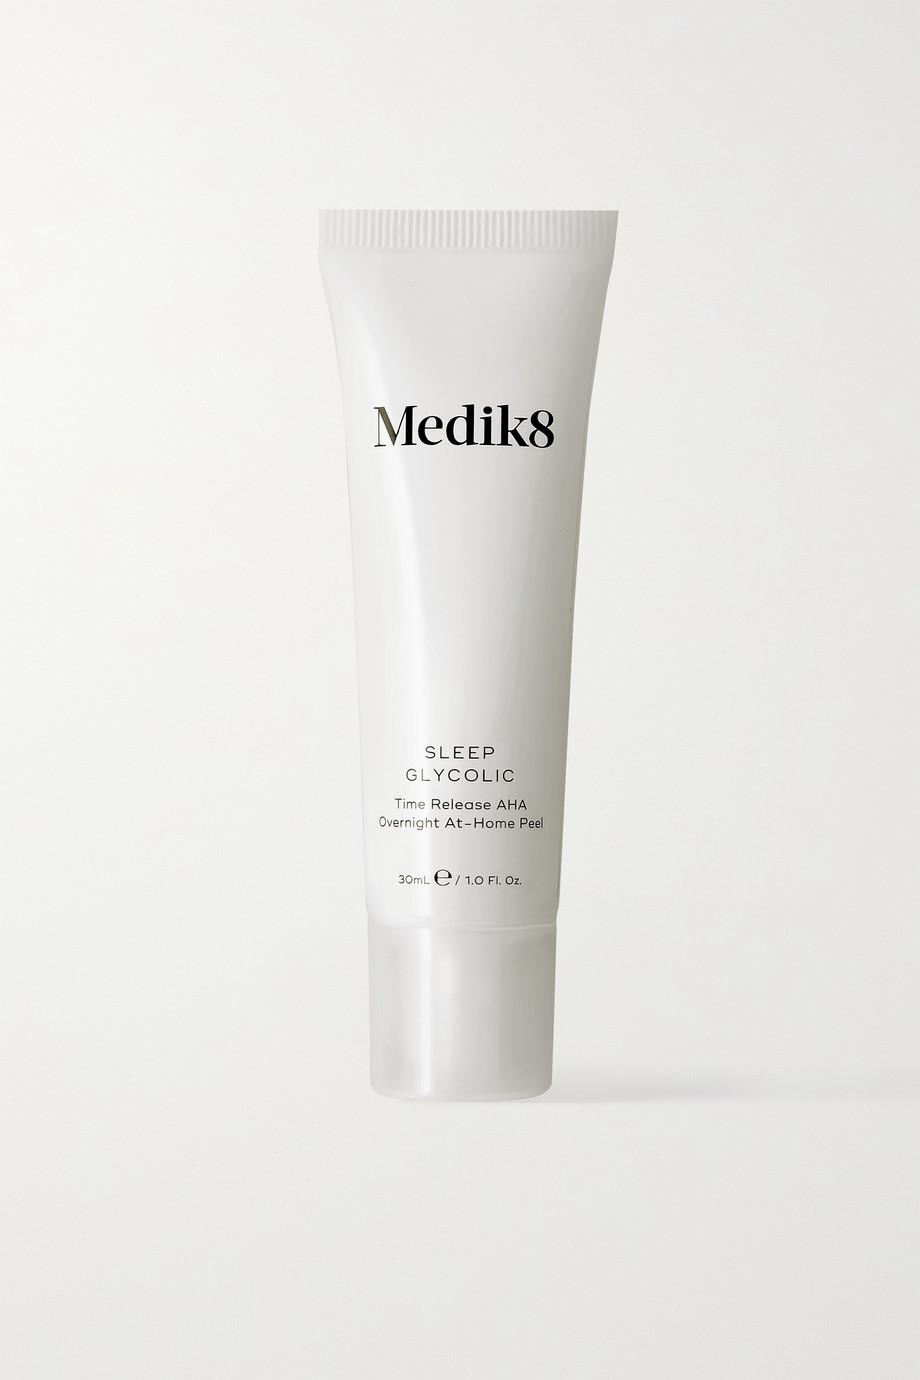 Medik8 Medik8 Sleep Glycolic, 30 ml – Serum